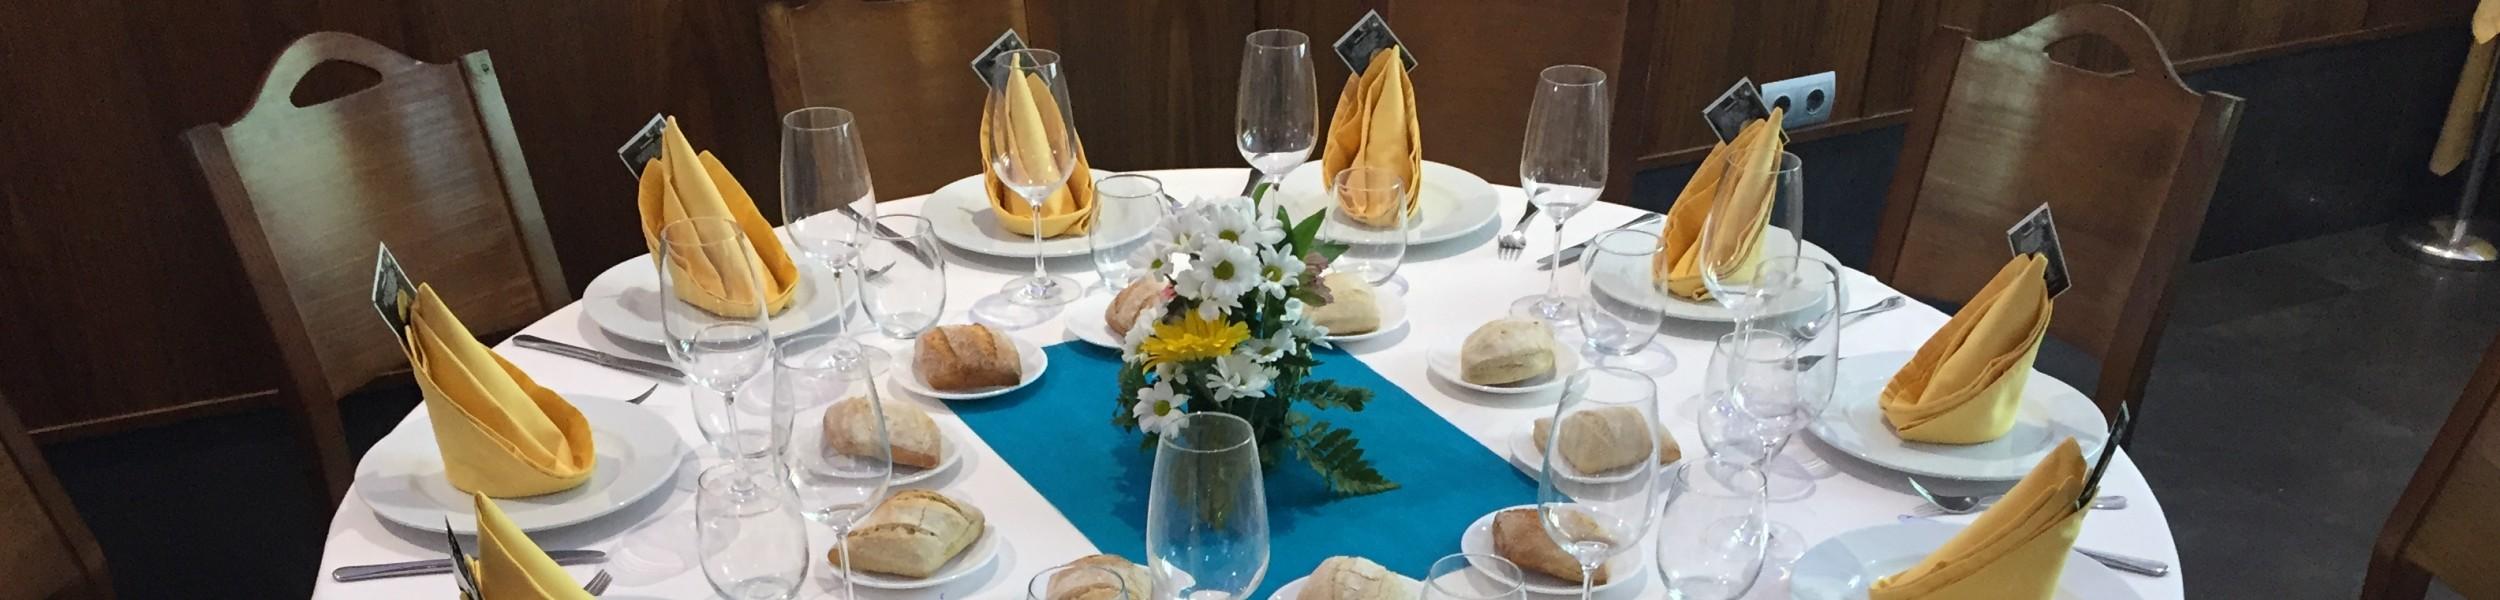 Bautizos · Comuniones · Bodas :: Restaurante La Plaza Torrent, Arrocería Torrent, Arroz Torrentí, Cassola de Sant Blai ::